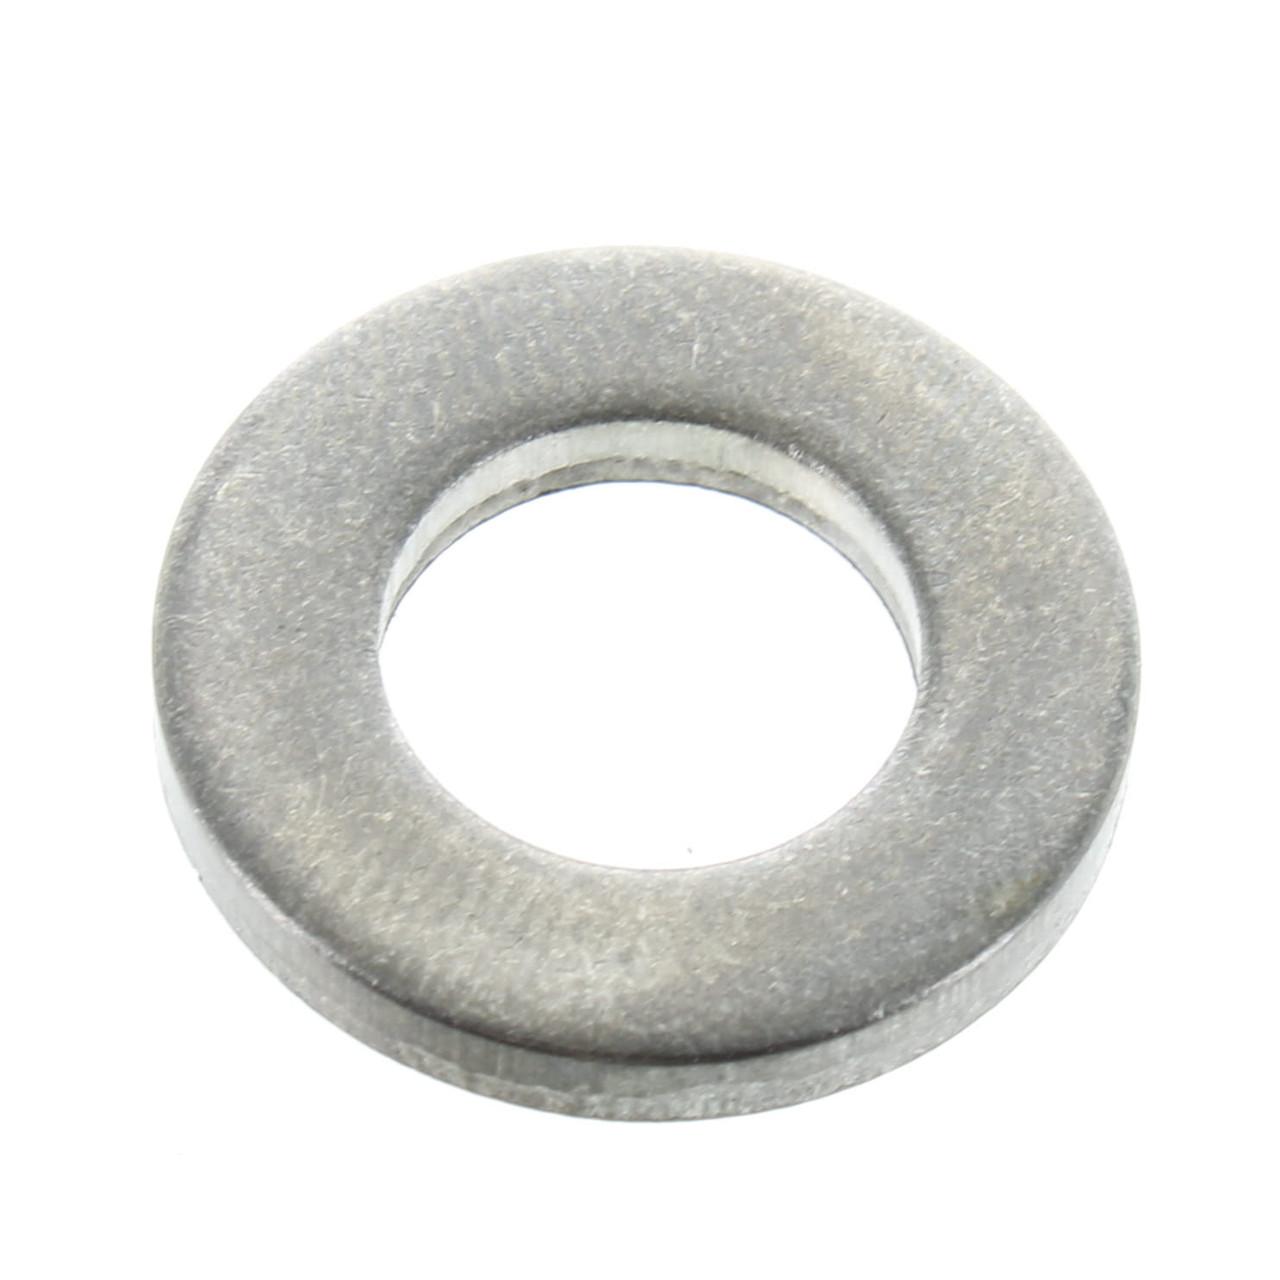 OEM Mercury//Quicksilver Washer Part# 12-856774